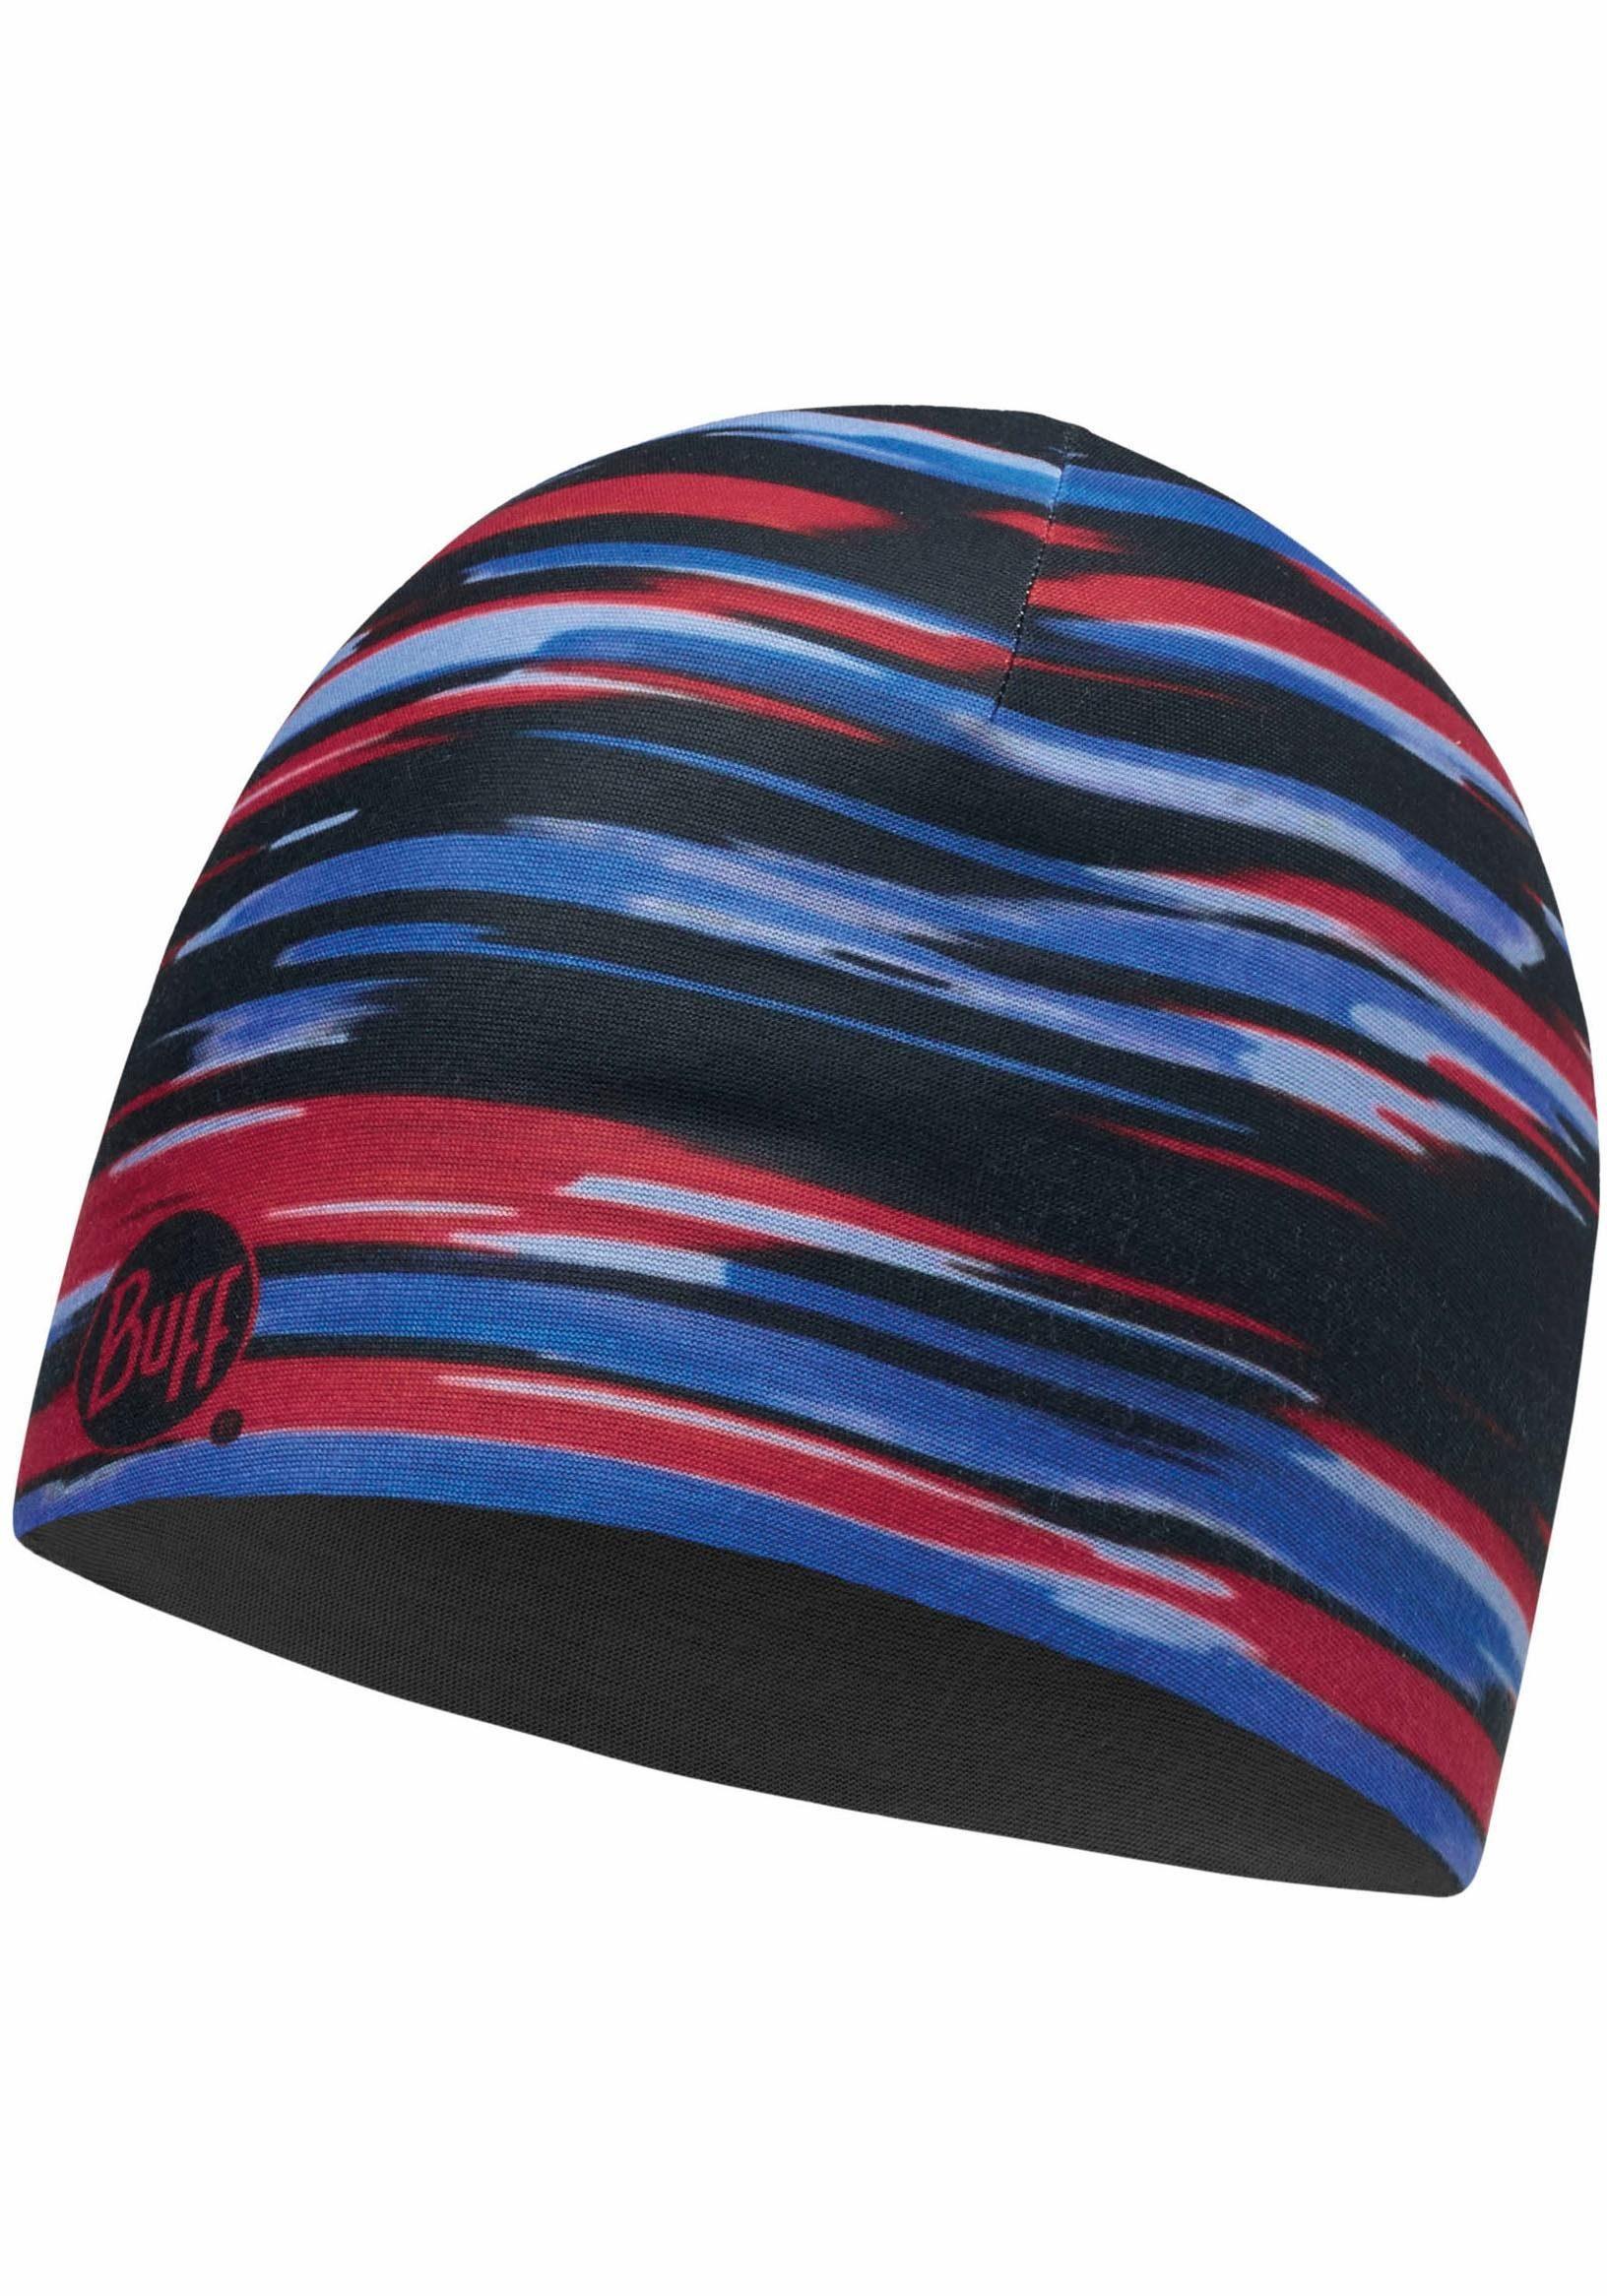 Buff Beanie »Microfiber Reversible Hat Buff«, Mütze